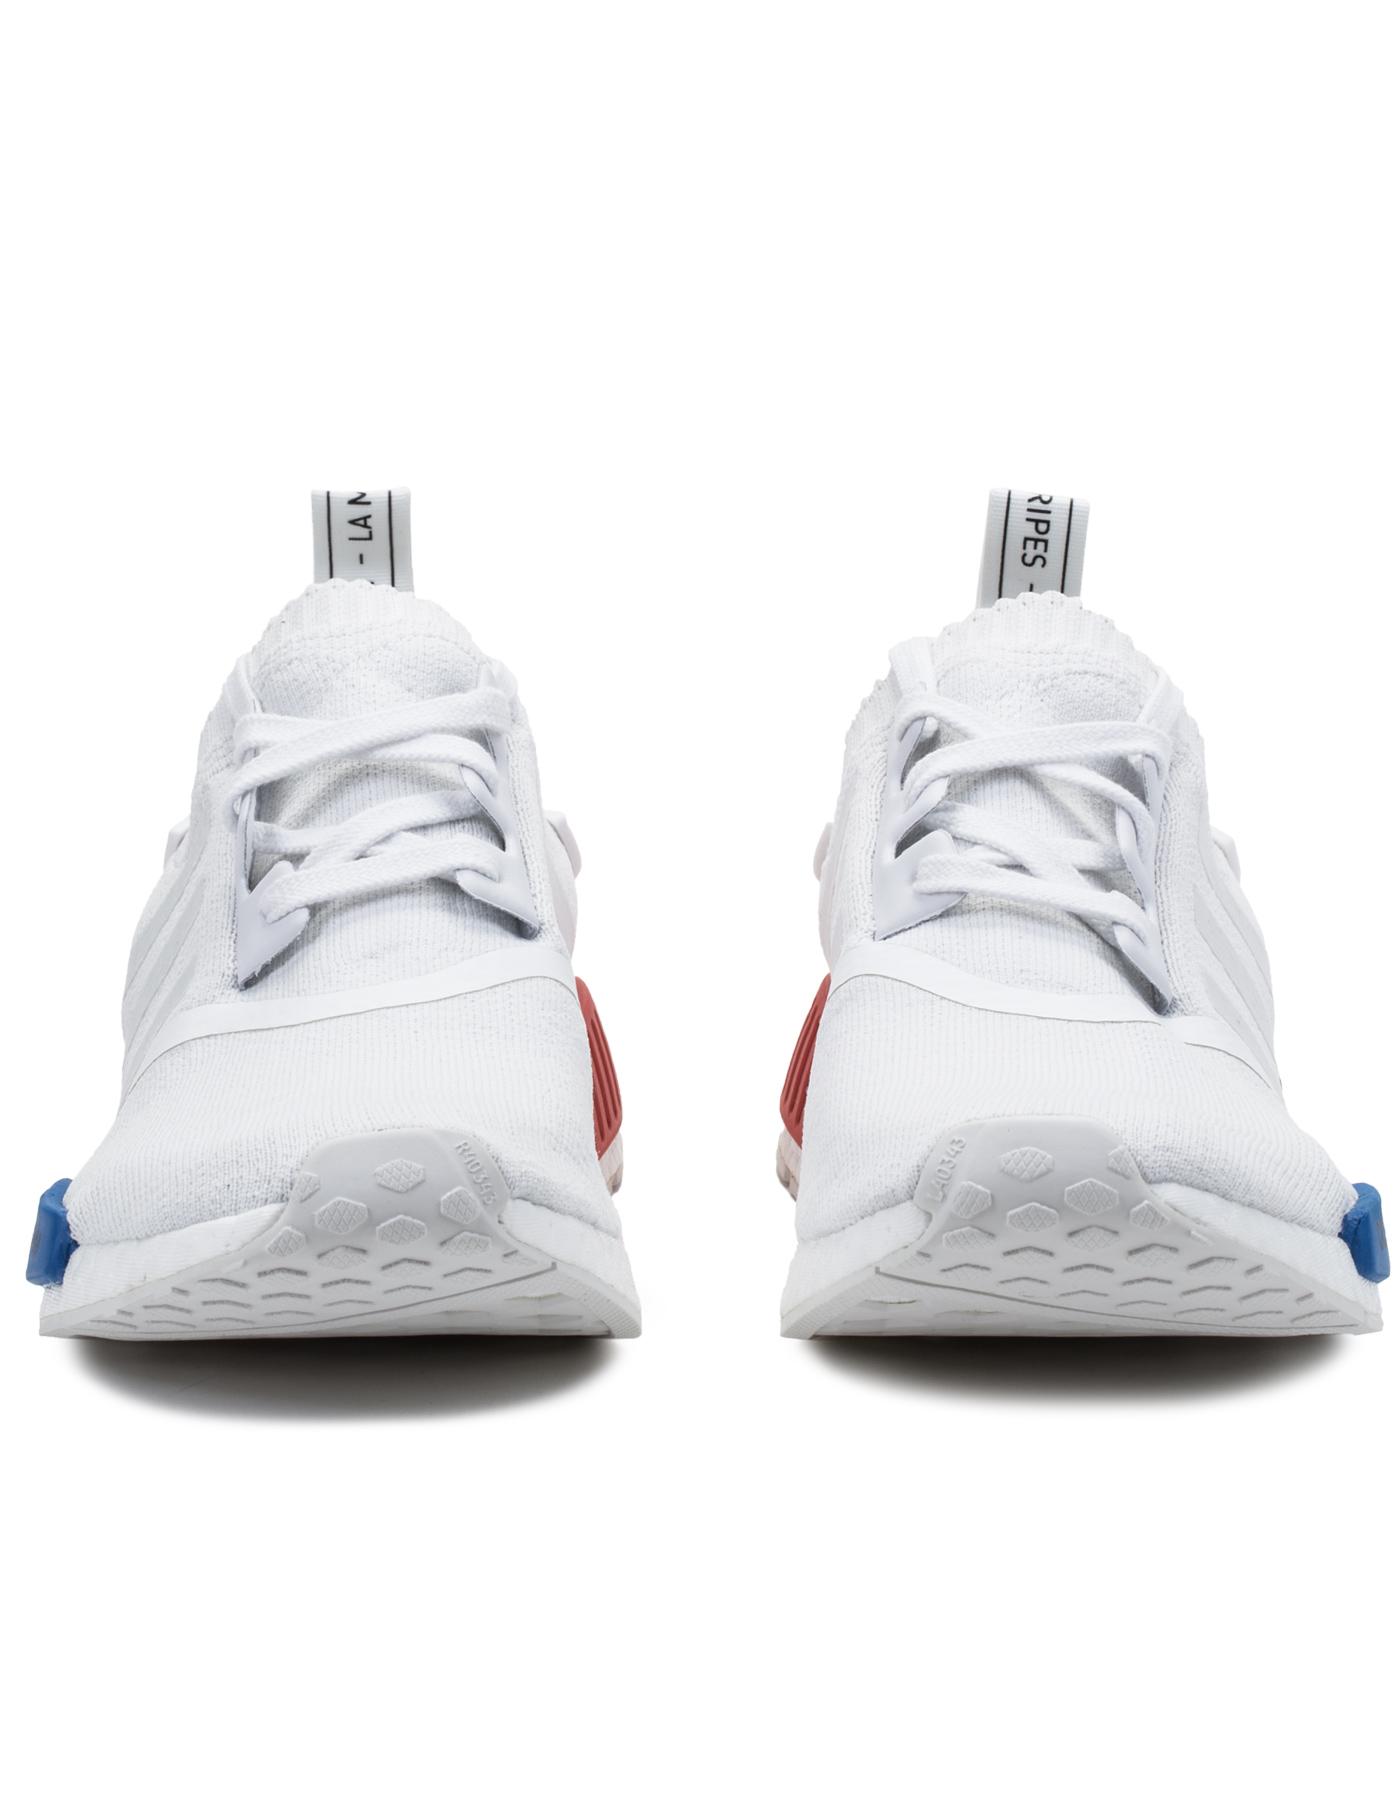 adidas yeezy boost 350 pirate black tubular doom on feet portal rh sua rb it